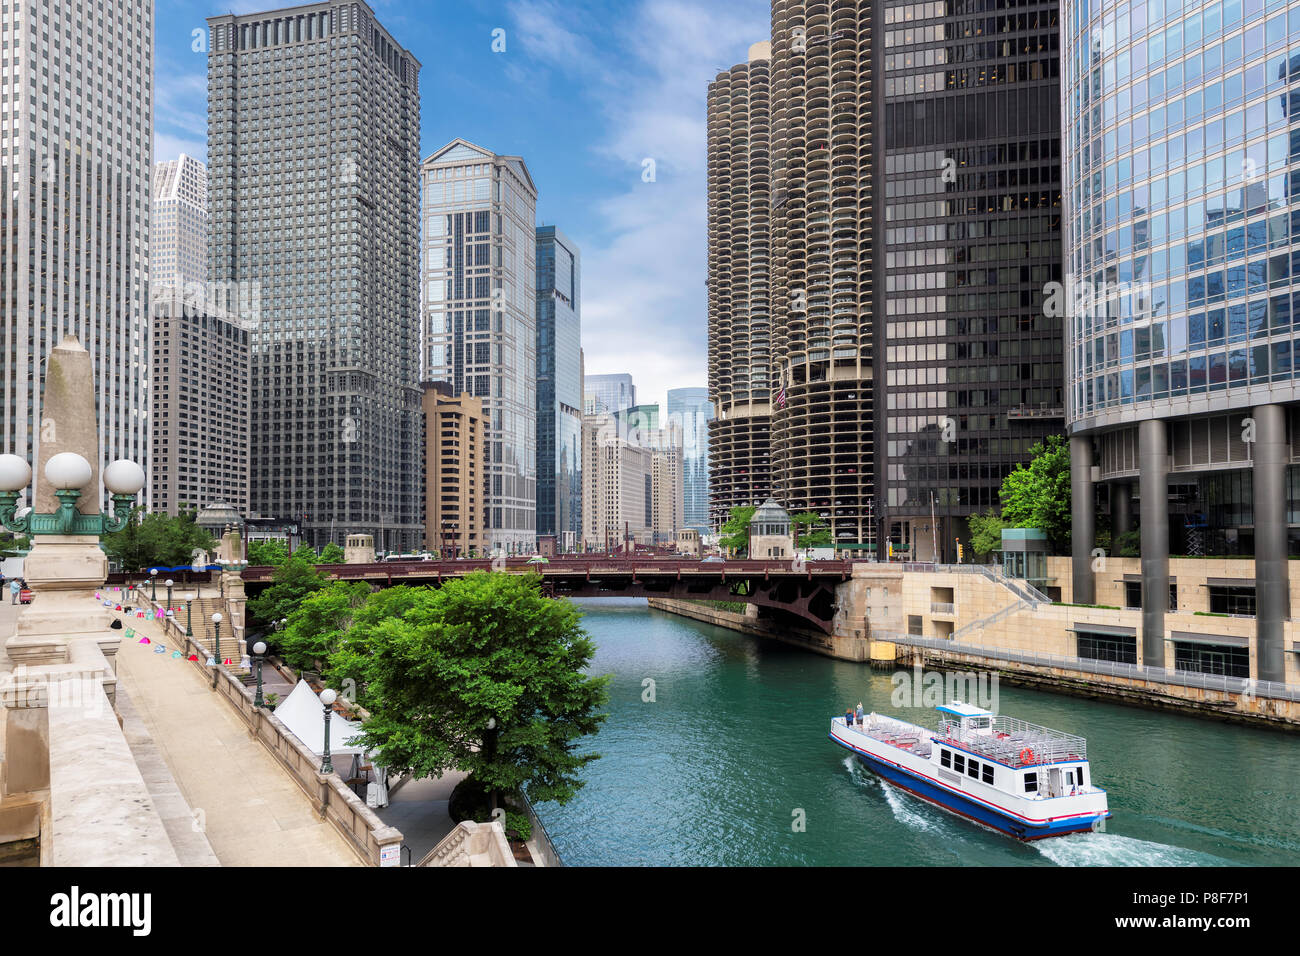 Chicago City skyline Photo Stock